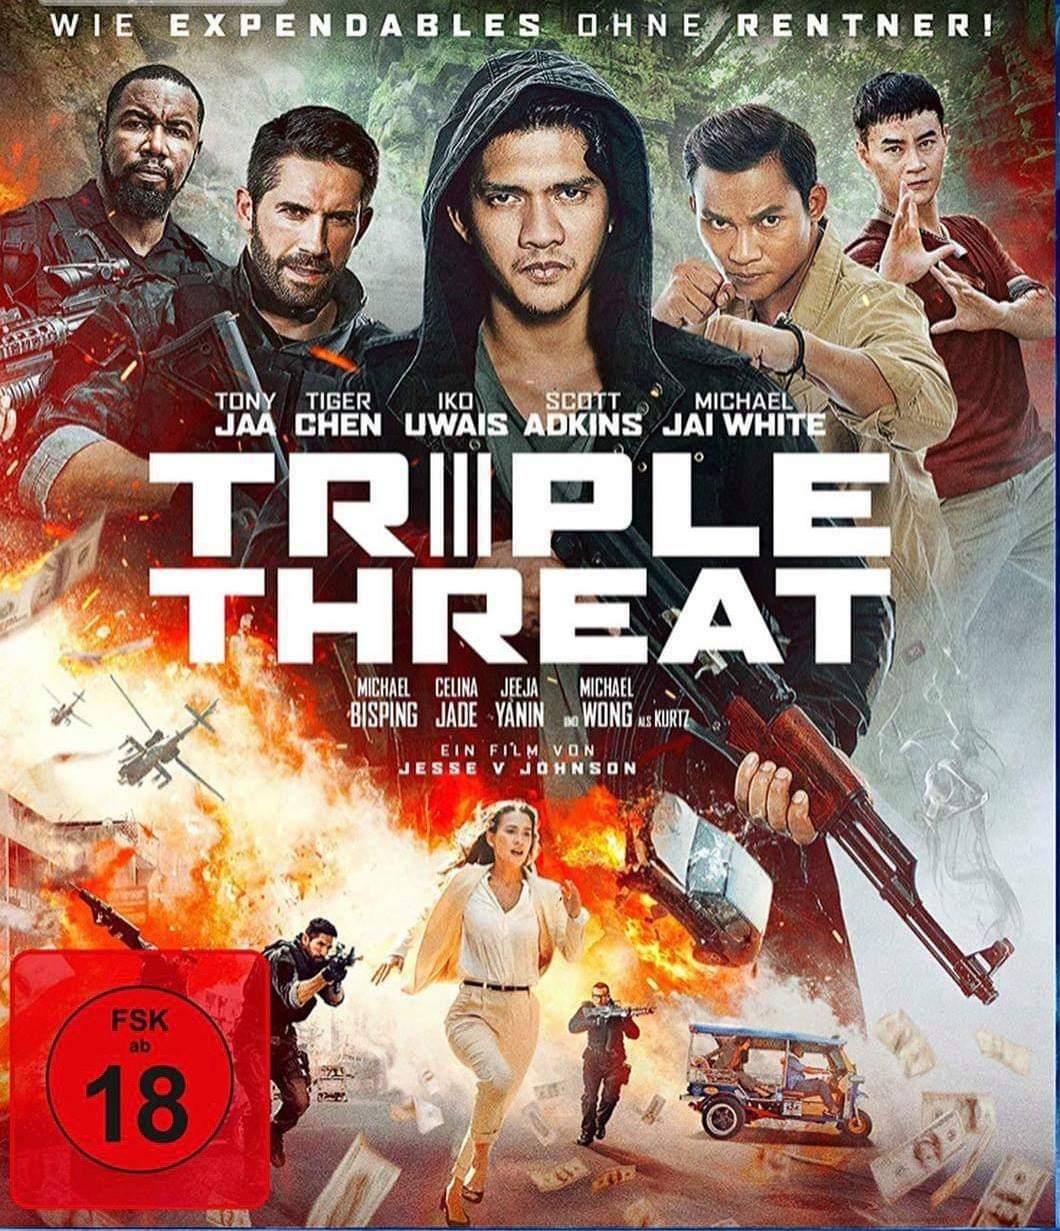 Scott Adkins, Tiger Hu Chen, Michael Jai White, Tony Jaa, Celina Jade, and Iko Uwais in Triple Threat (2019)